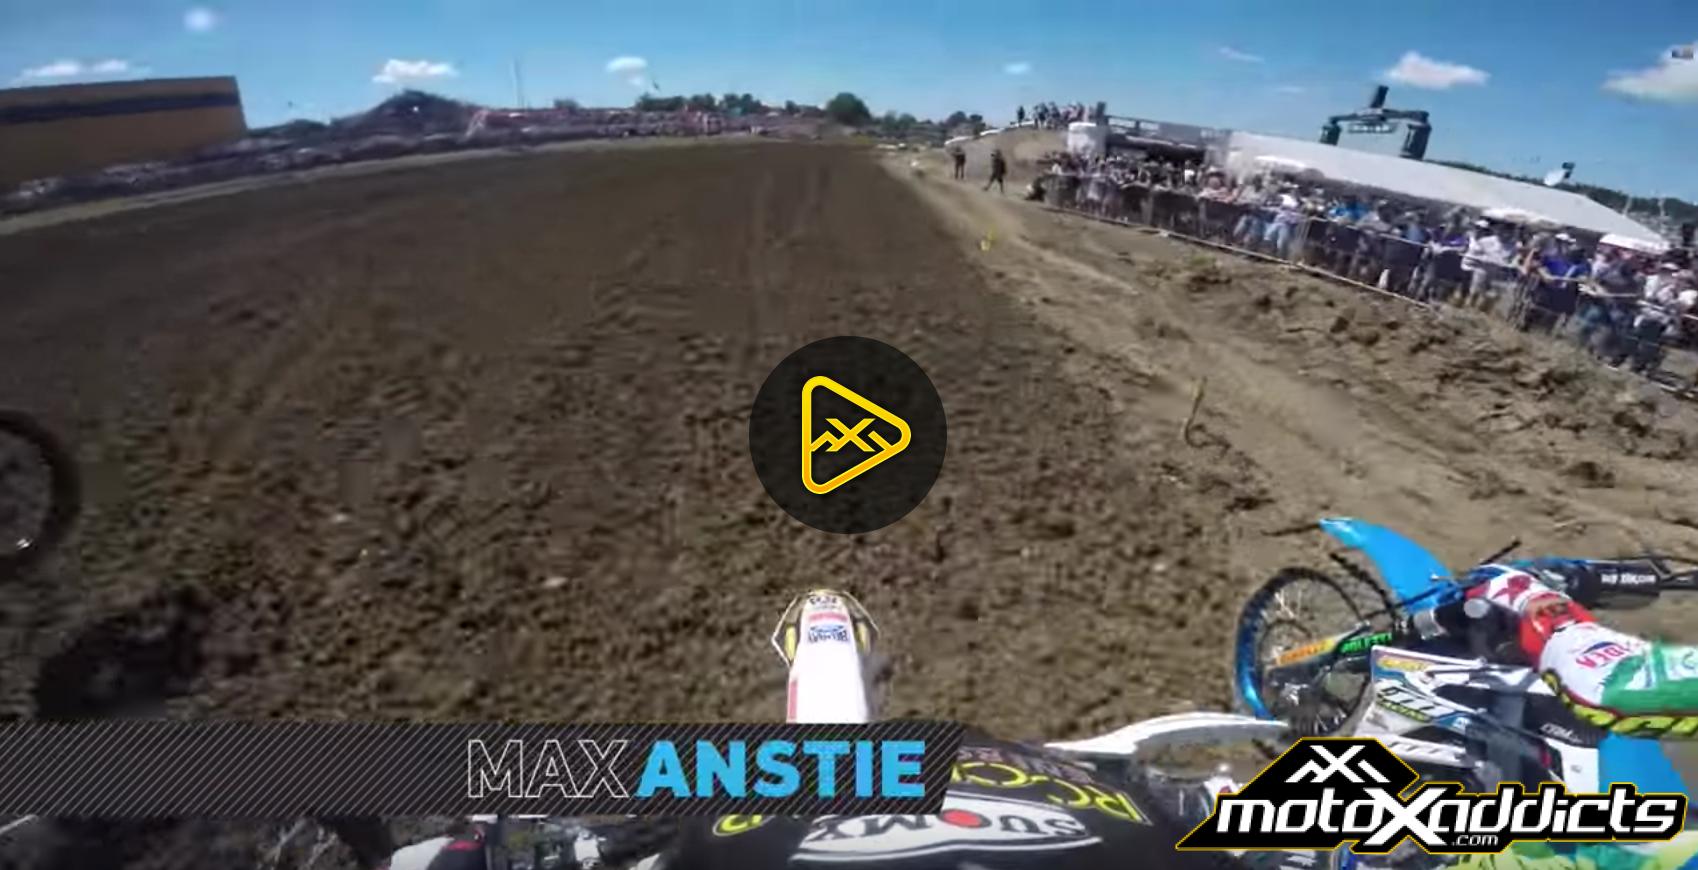 GoPro – Max Antie at 2016 MXGP of Switzerland